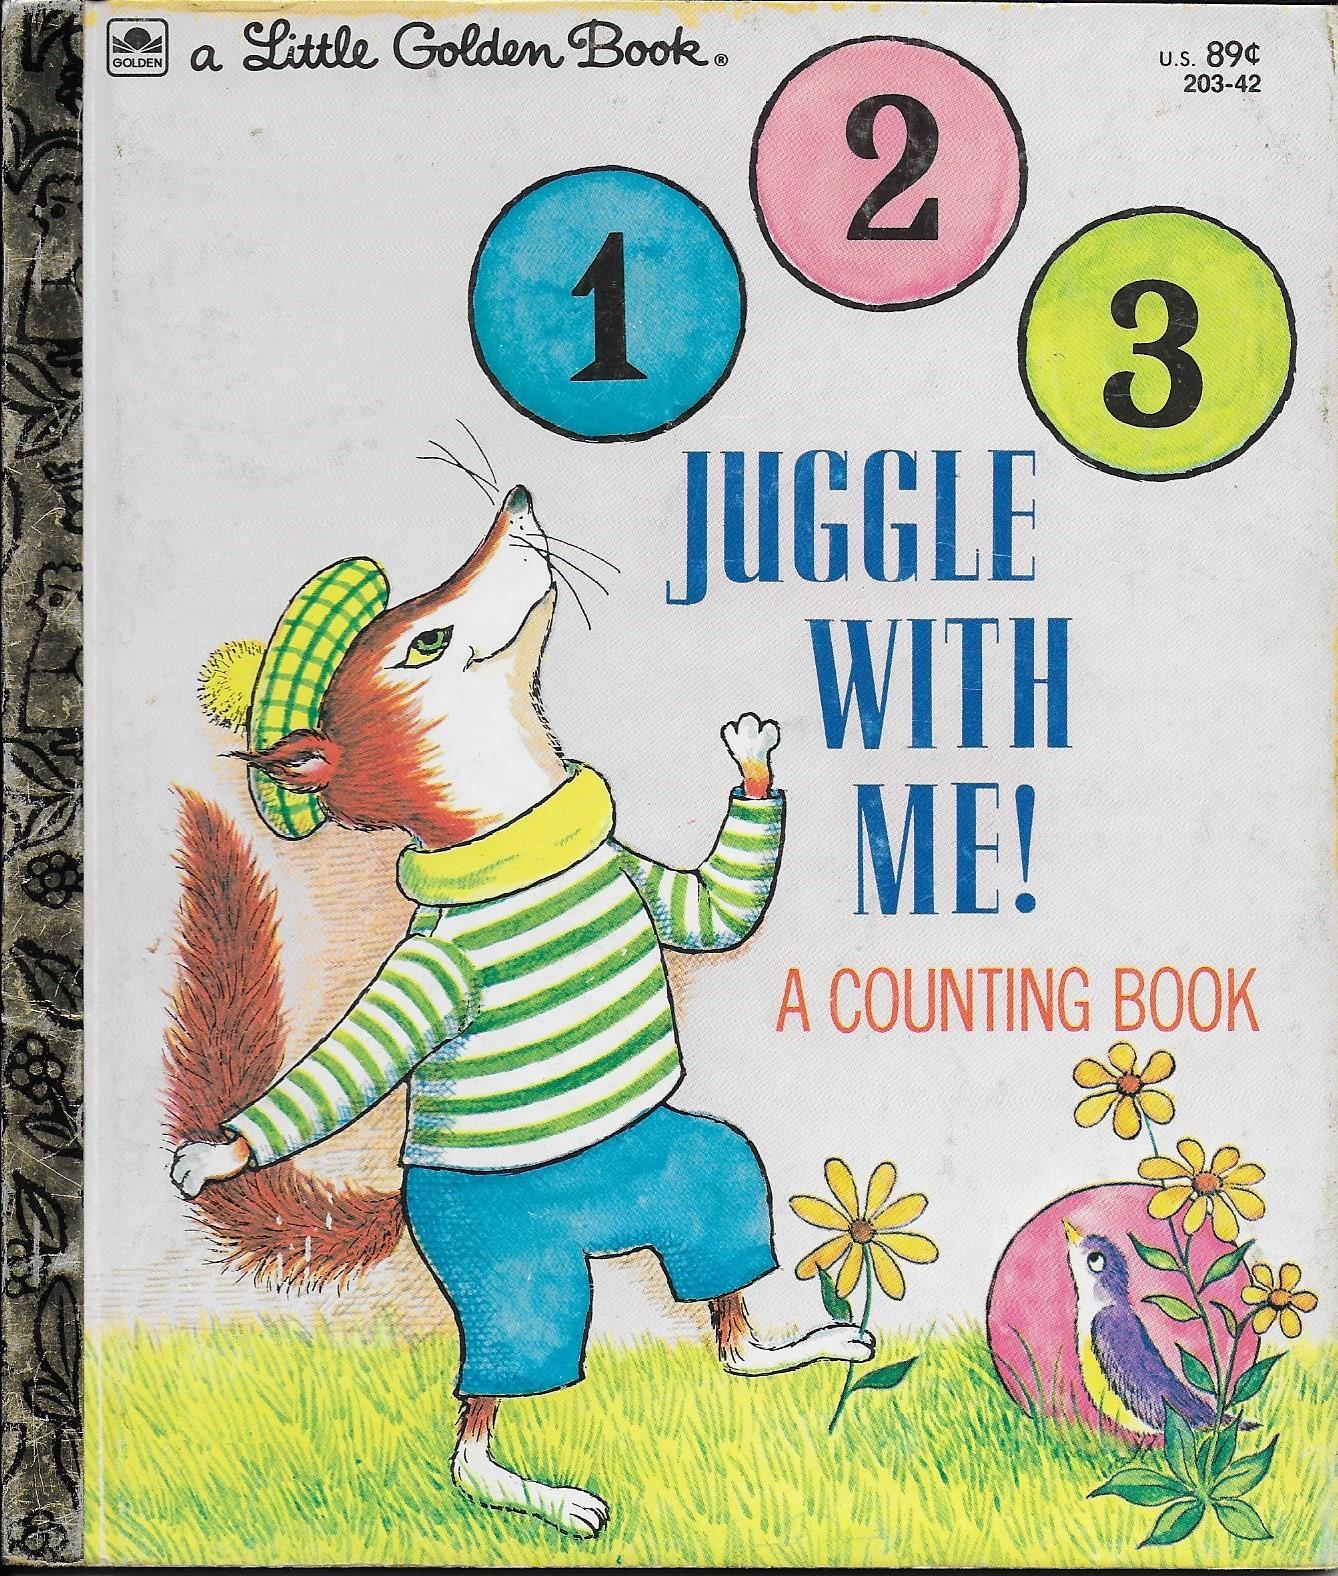 1 2 3 Juggle With Me!